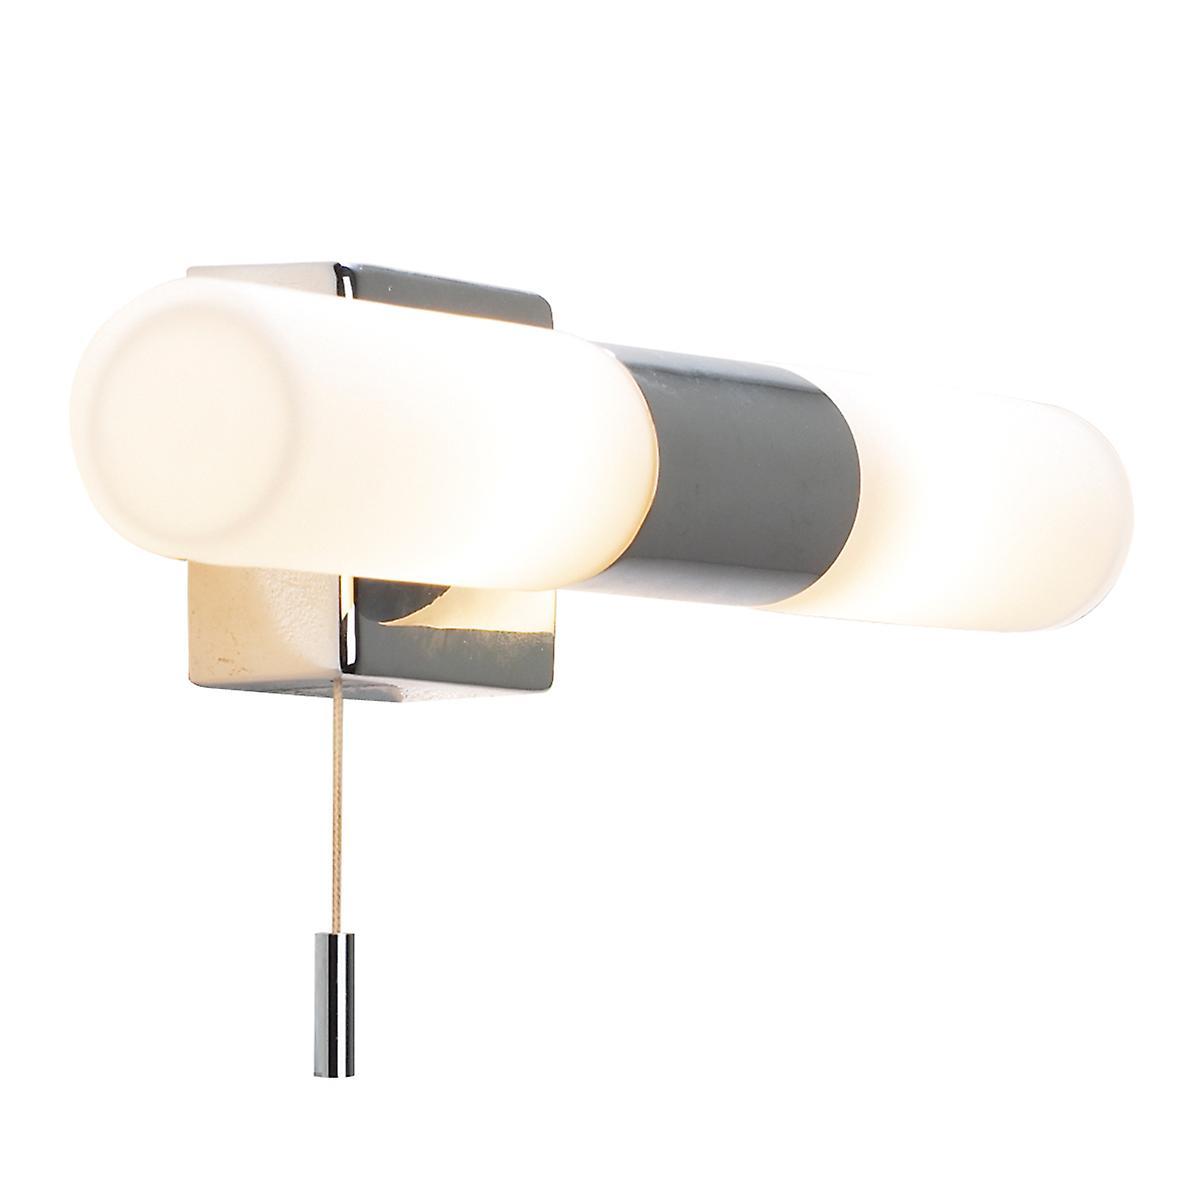 Dar BUE0950 Bueno Modern Switched Halogen Bathroom Wall Light